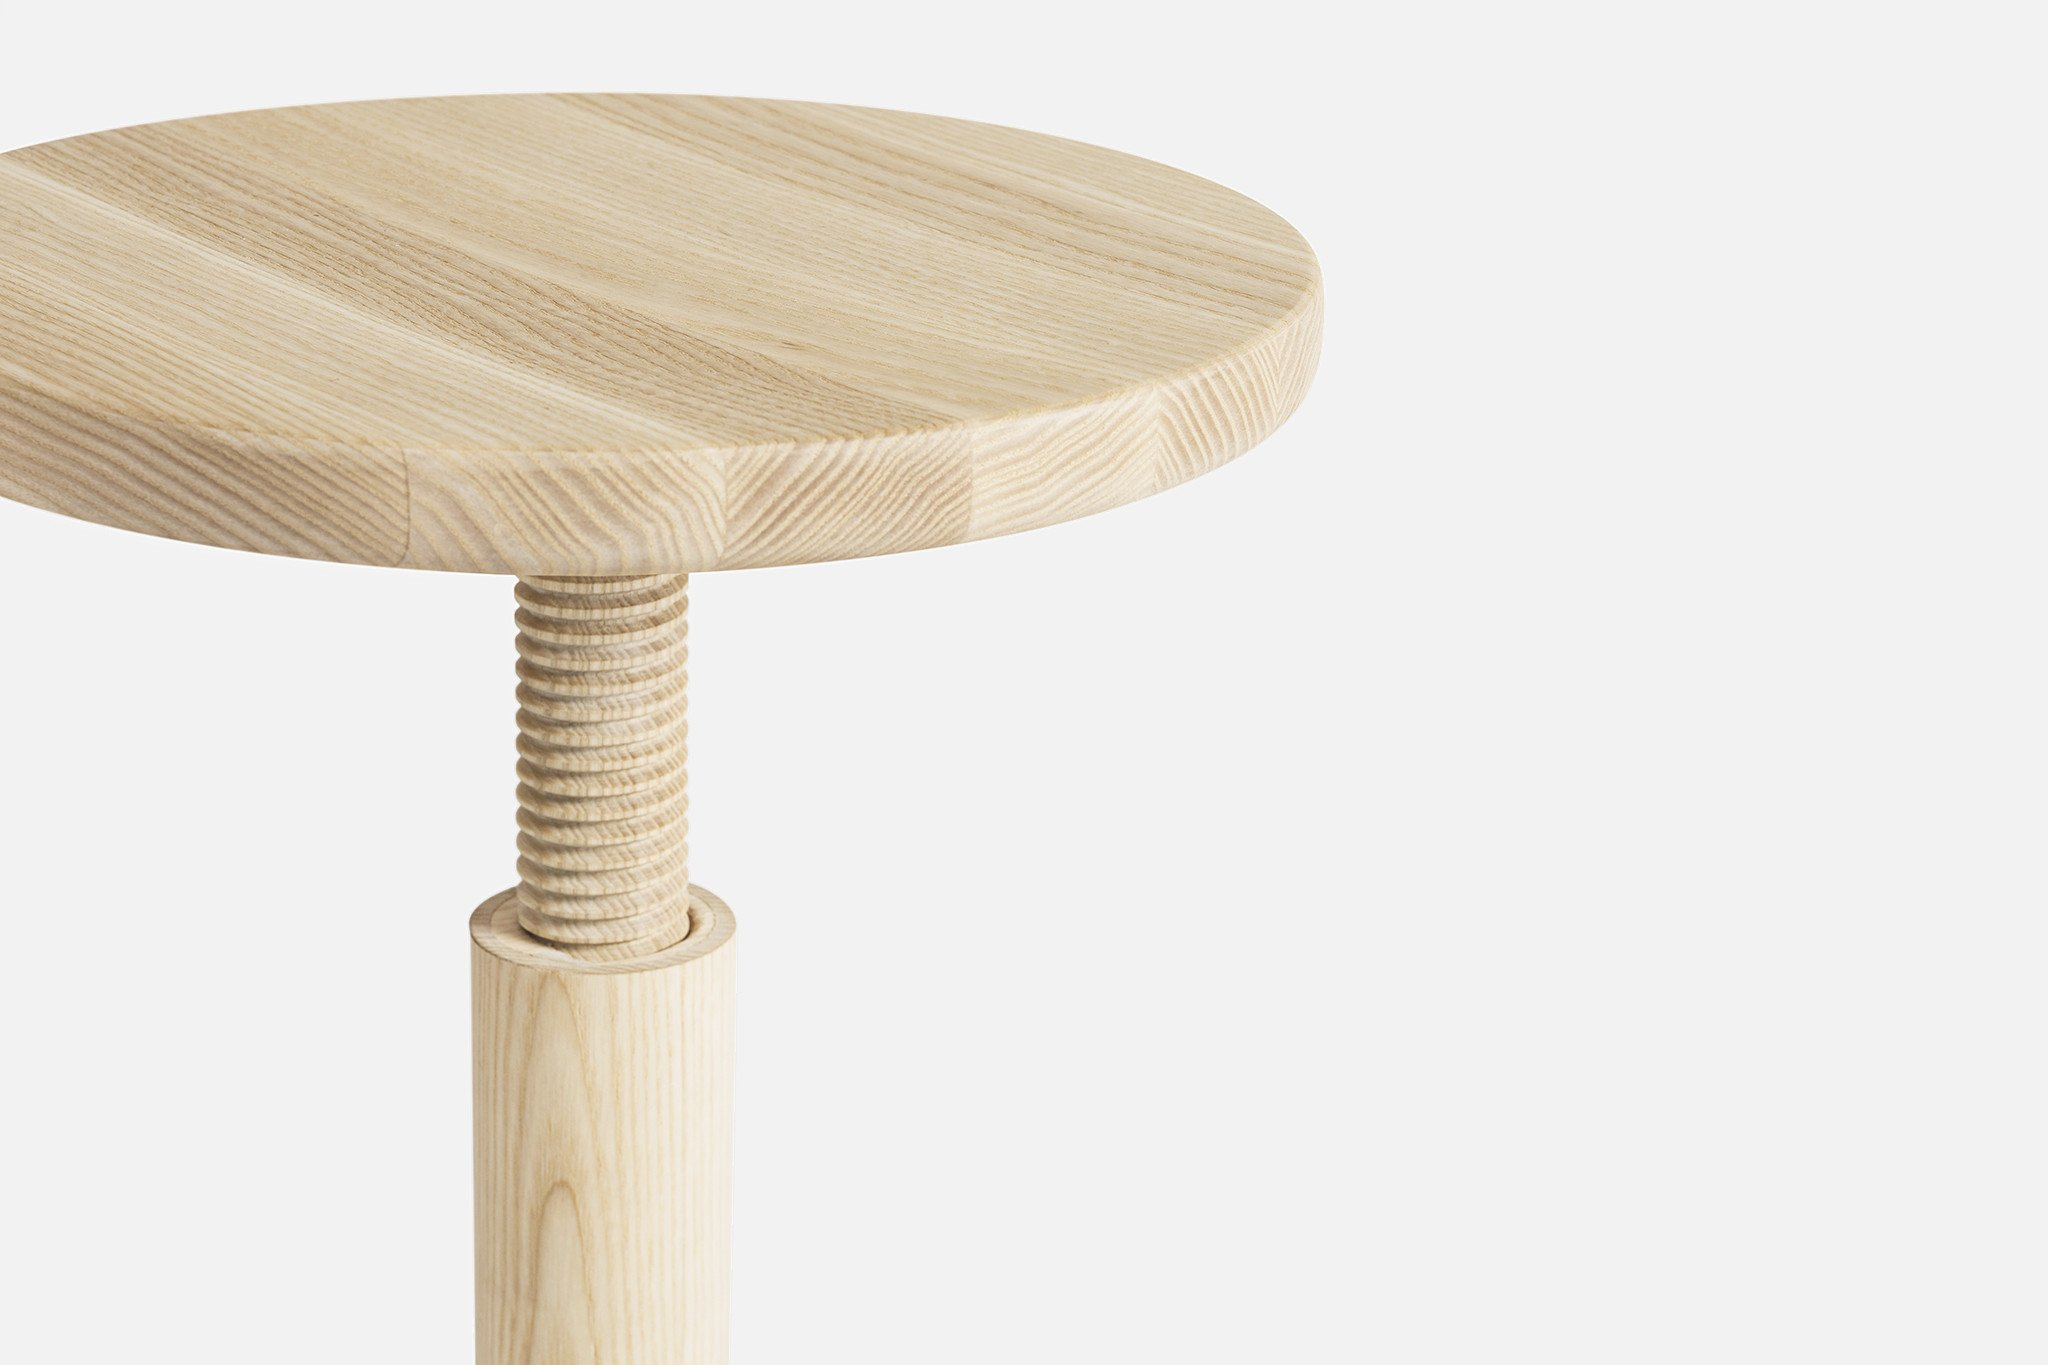 All Wood Stool by Karoline Fesser